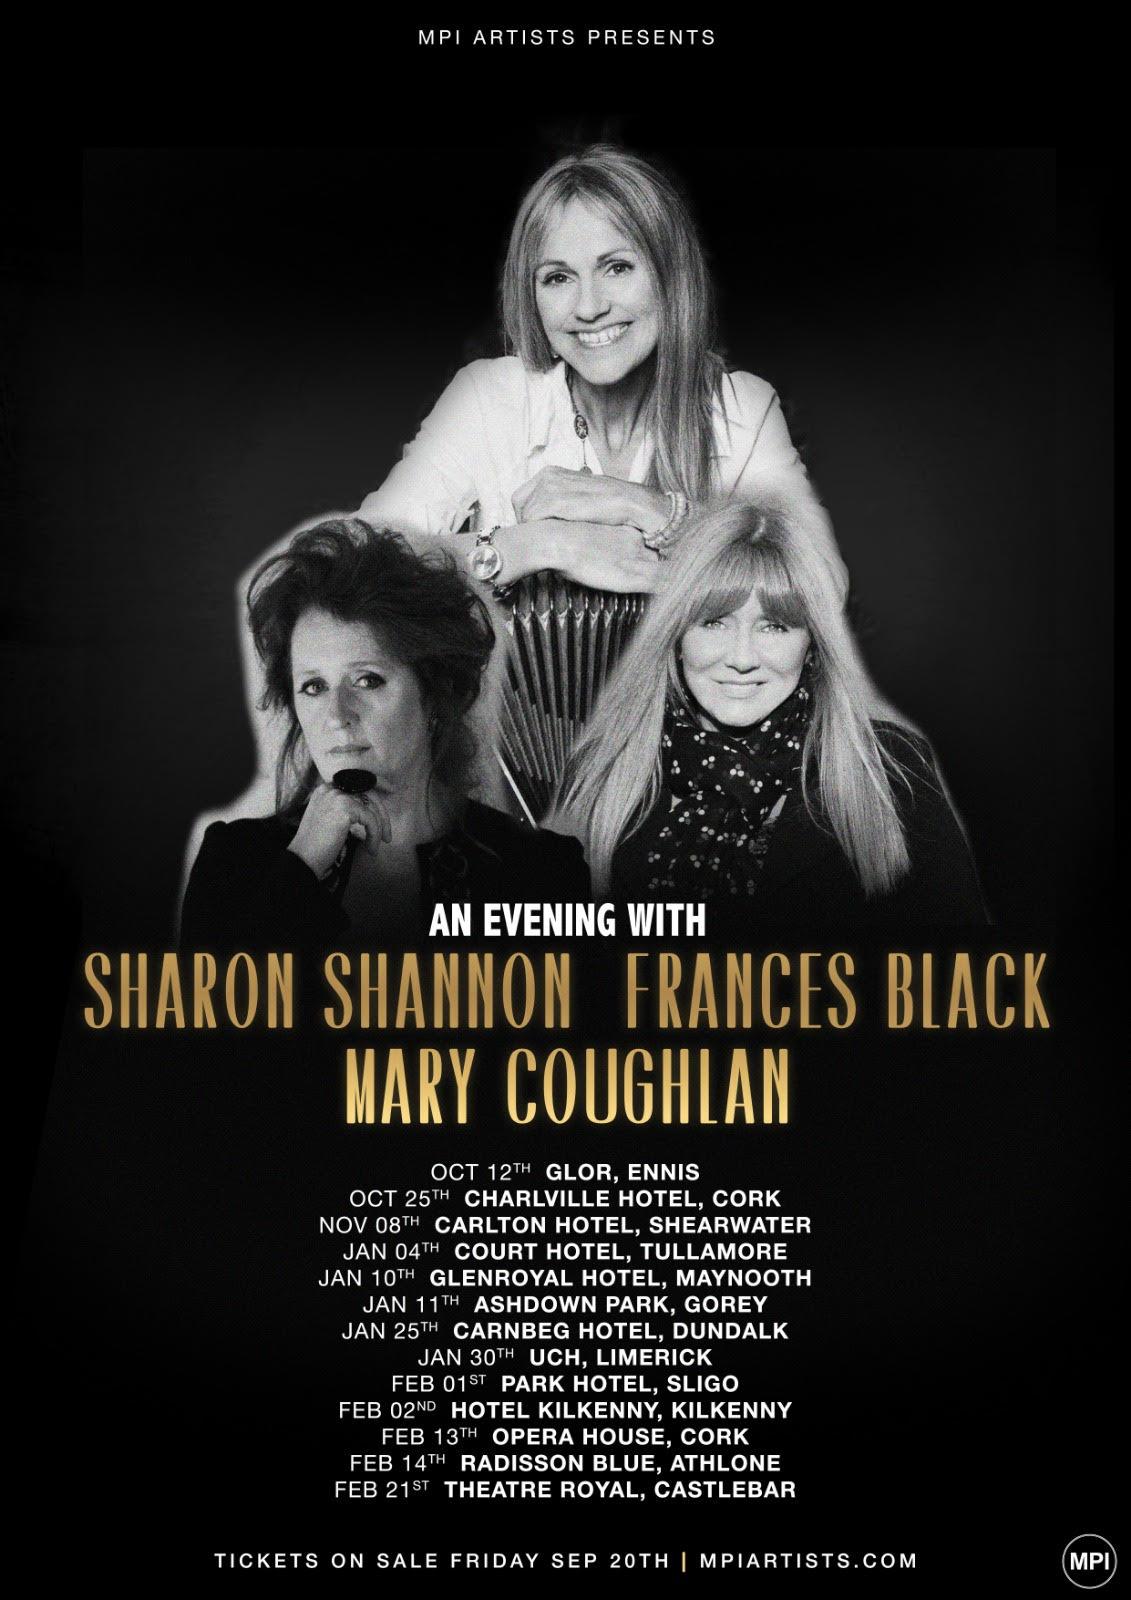 Sharon Shannon, Frances Black, Mary Coughlan